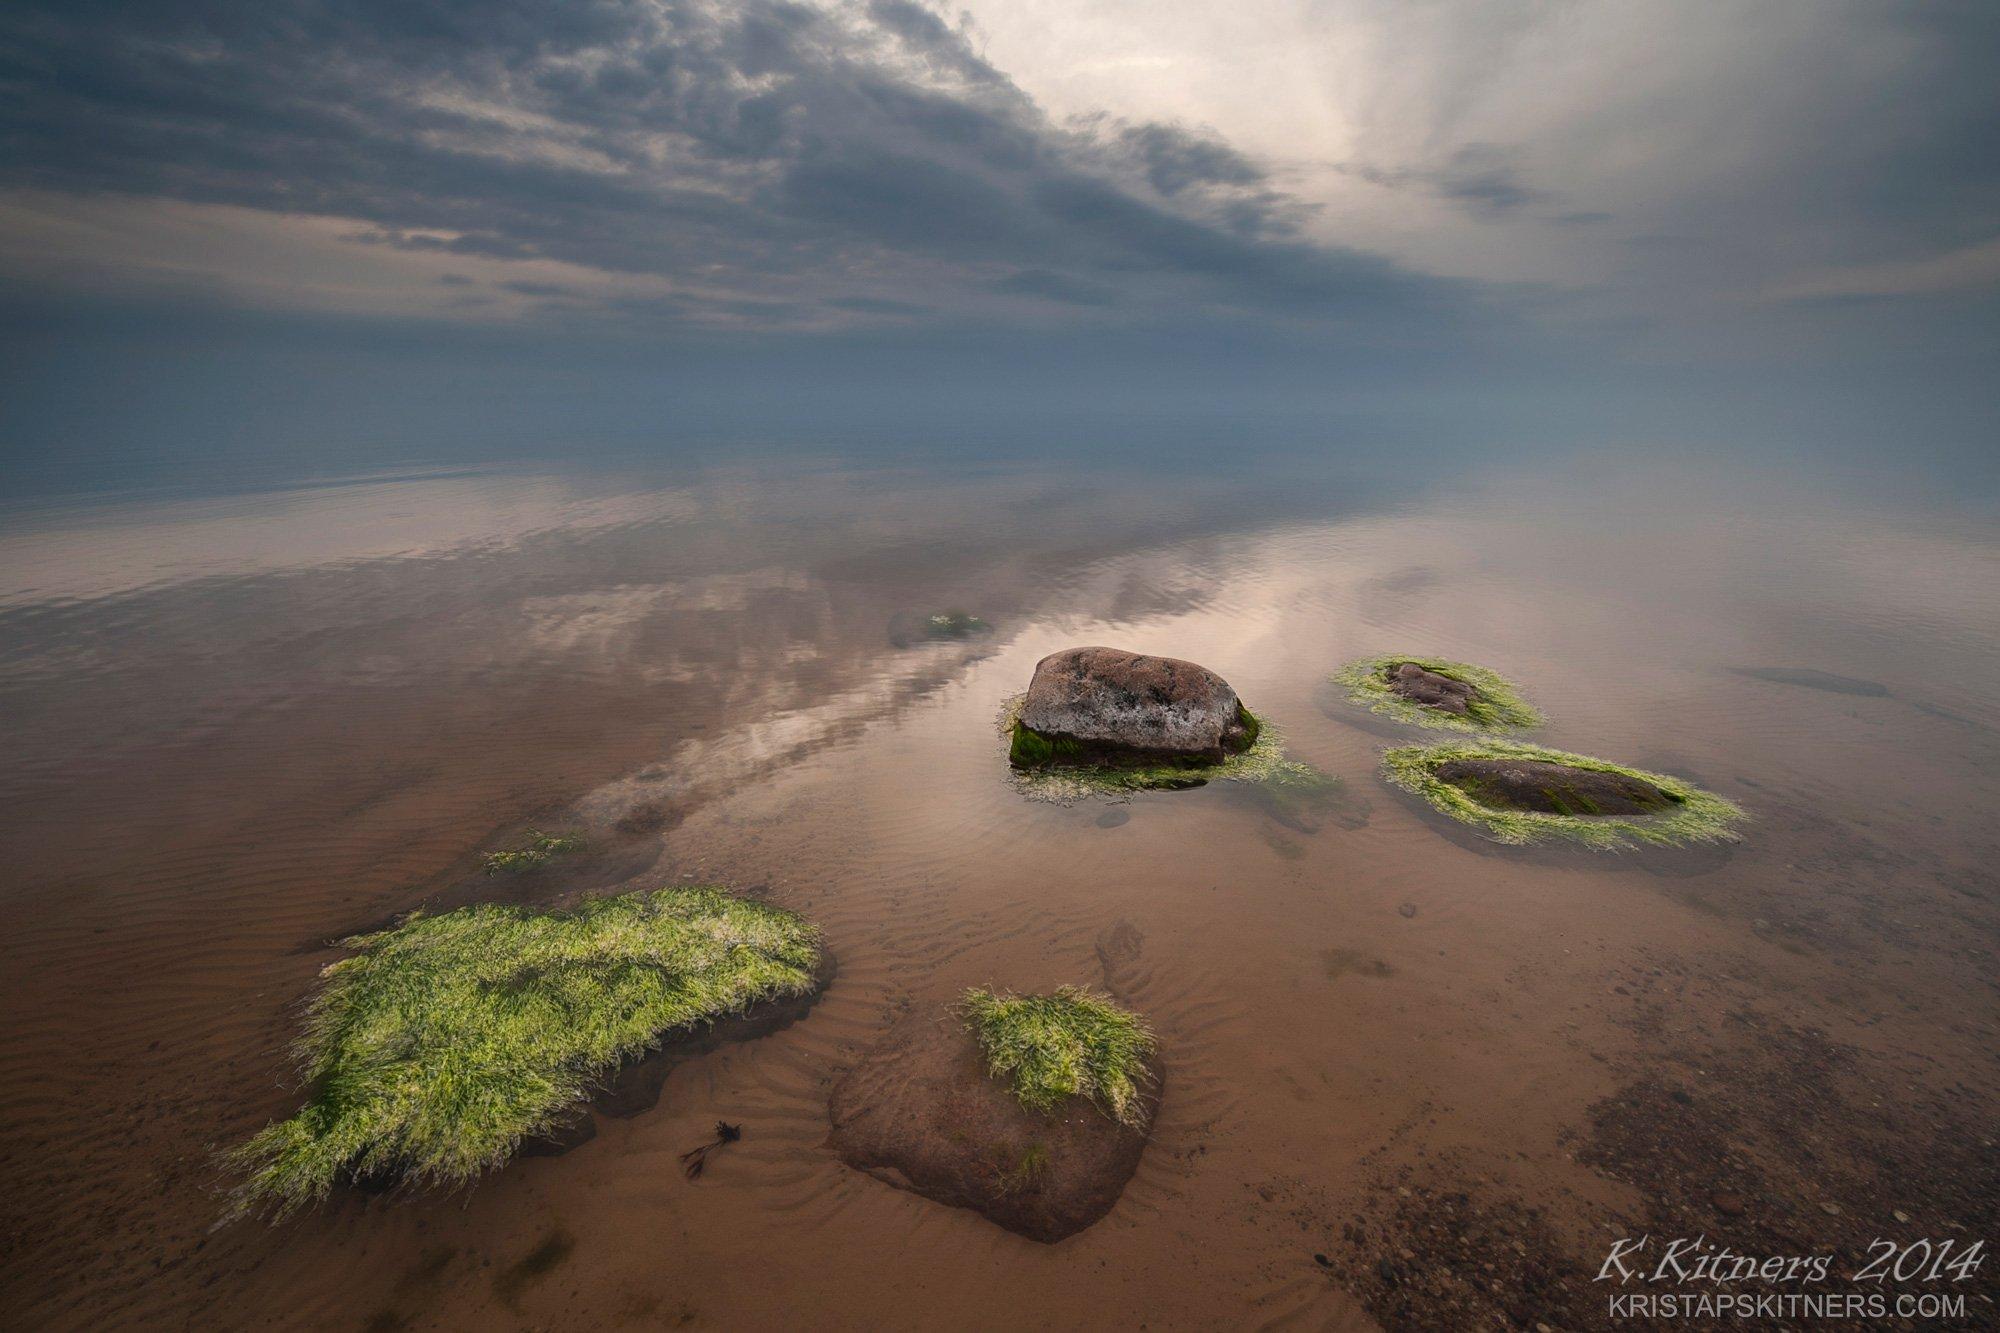 sea seascape water grass fog sky clouds stone reflection sunset evening latvia, Kristaps Kitners